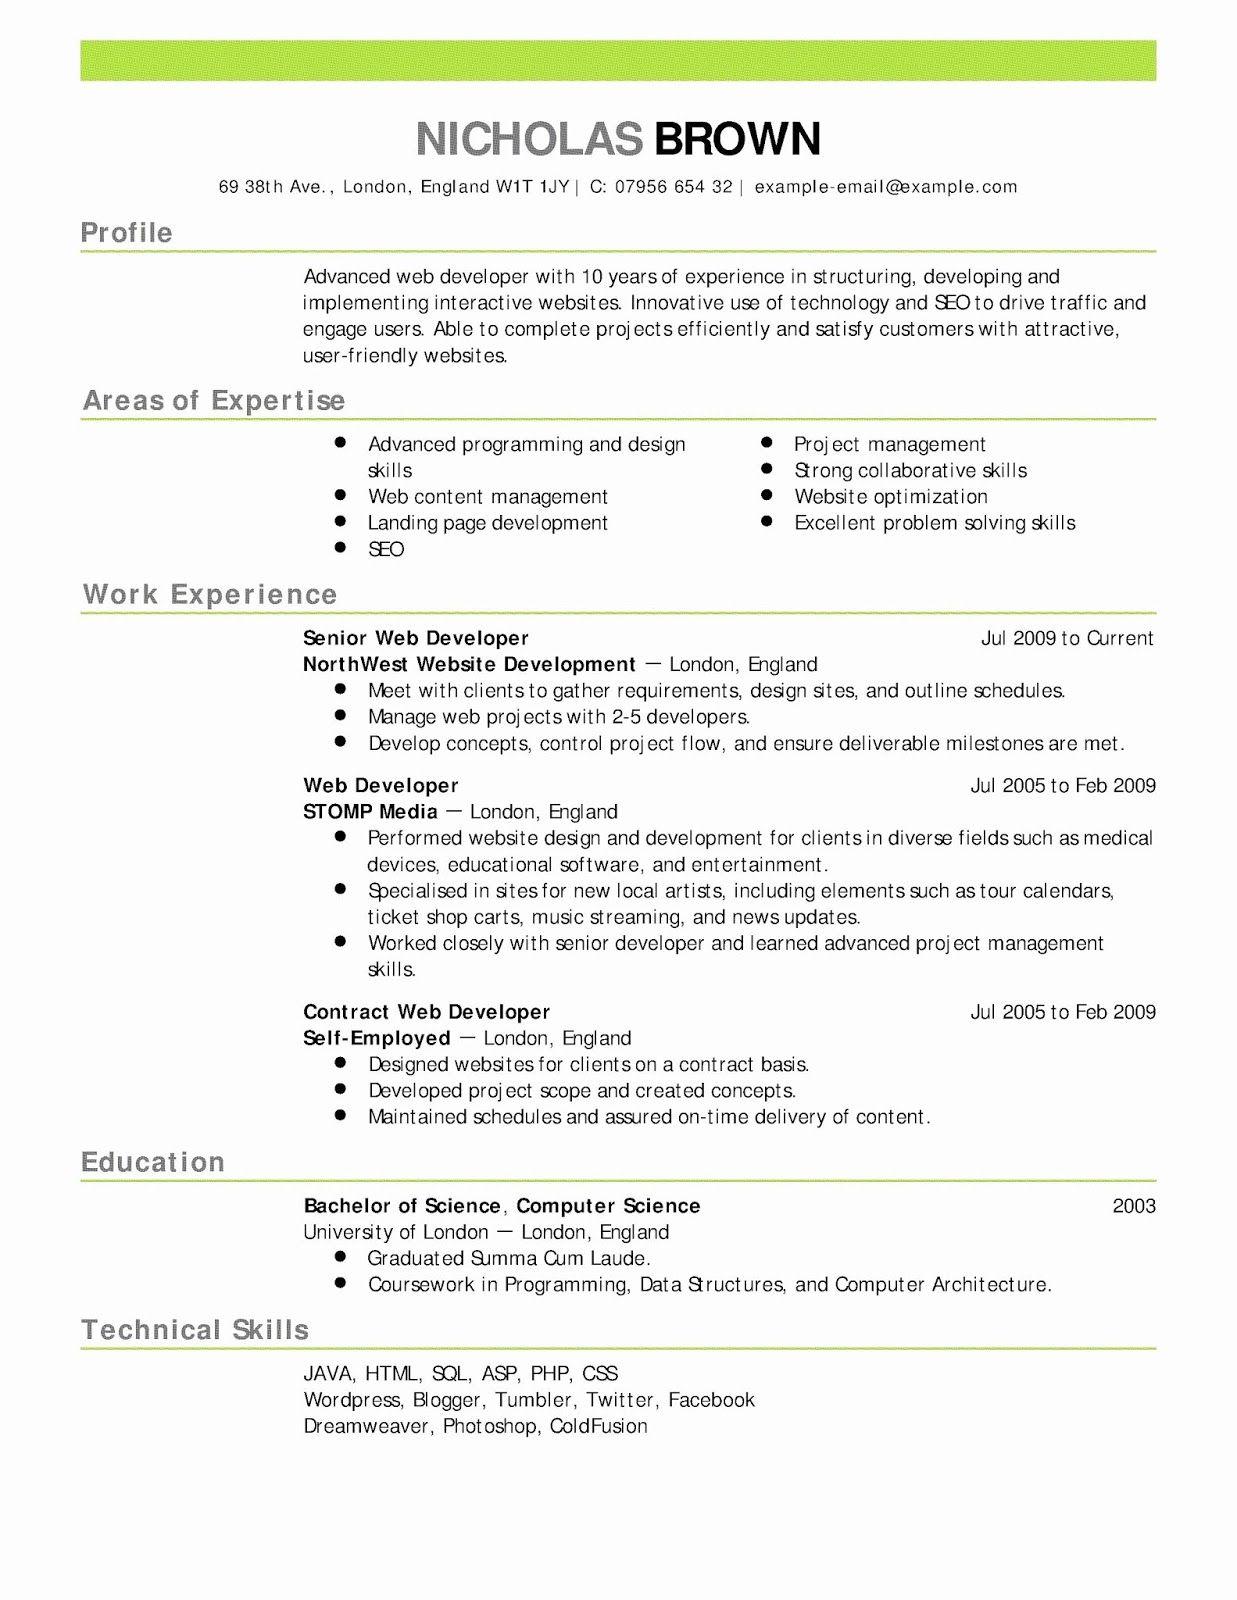 Warehouse Resume Template Free 2019 Warehouse Manager Resume Templates 2020 Warehouse Clerk Resume Templates Teaching Resume Job Resume Examples Resume Skills